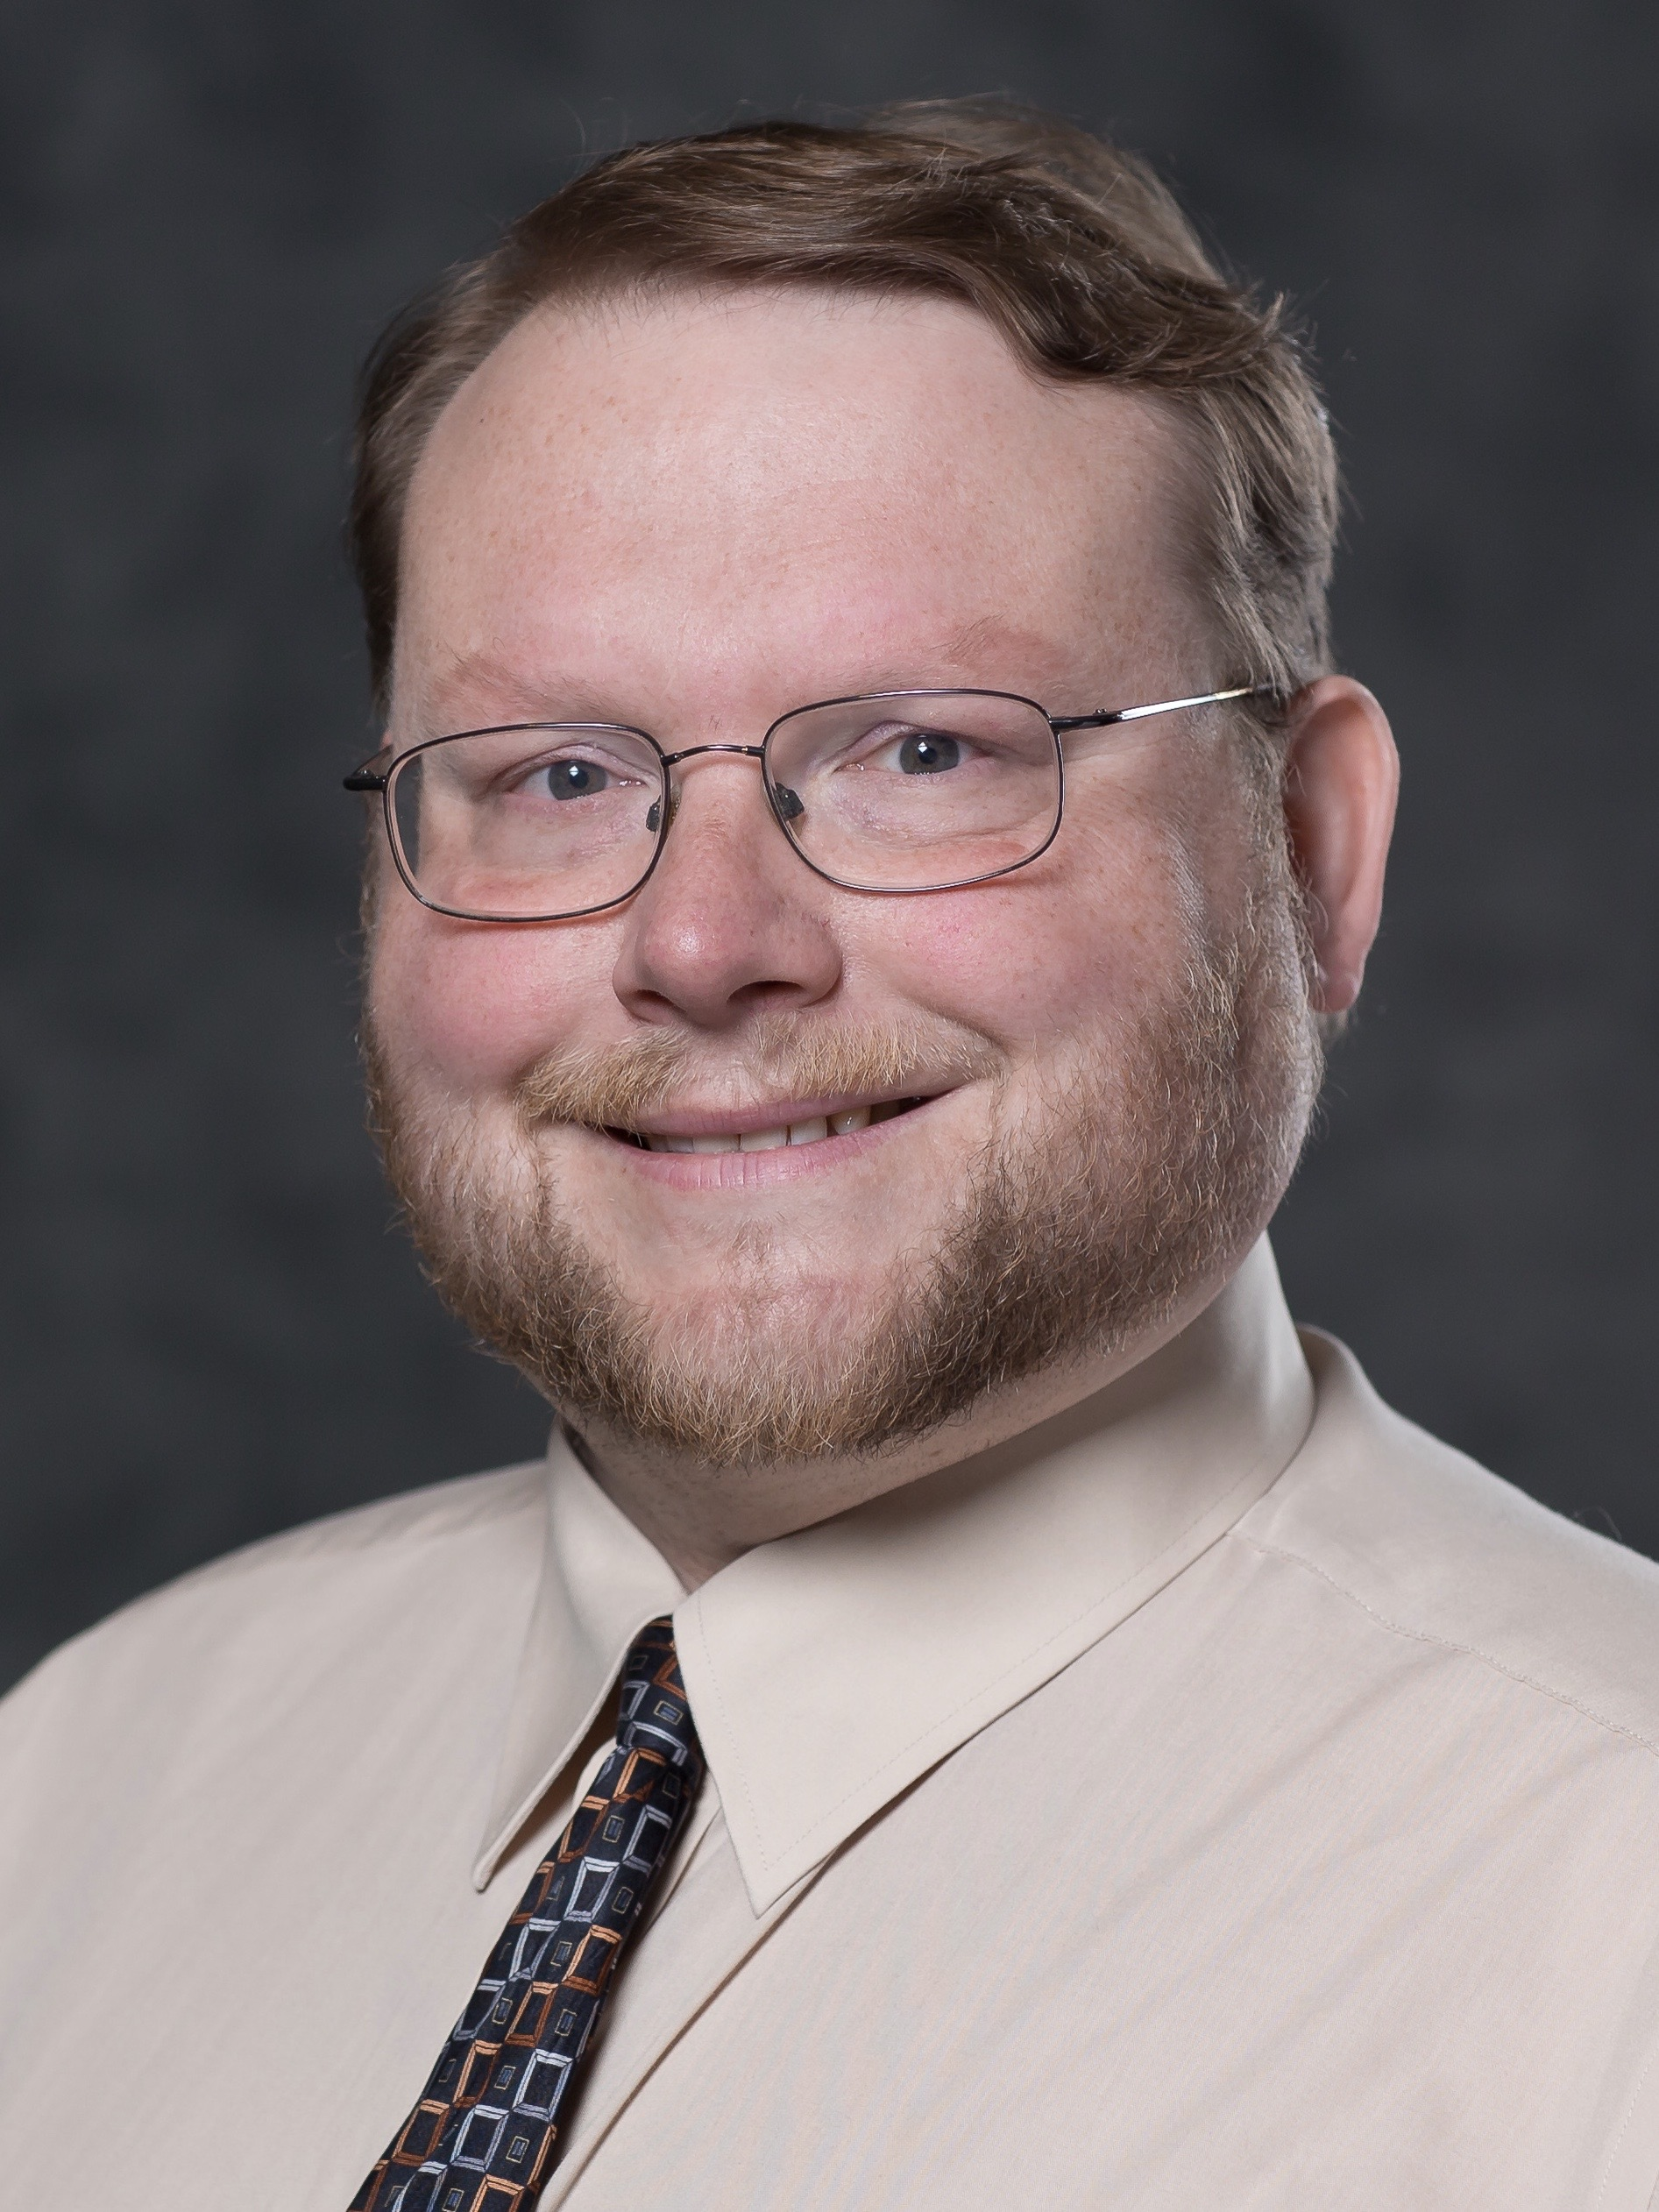 Casey Jakubowski